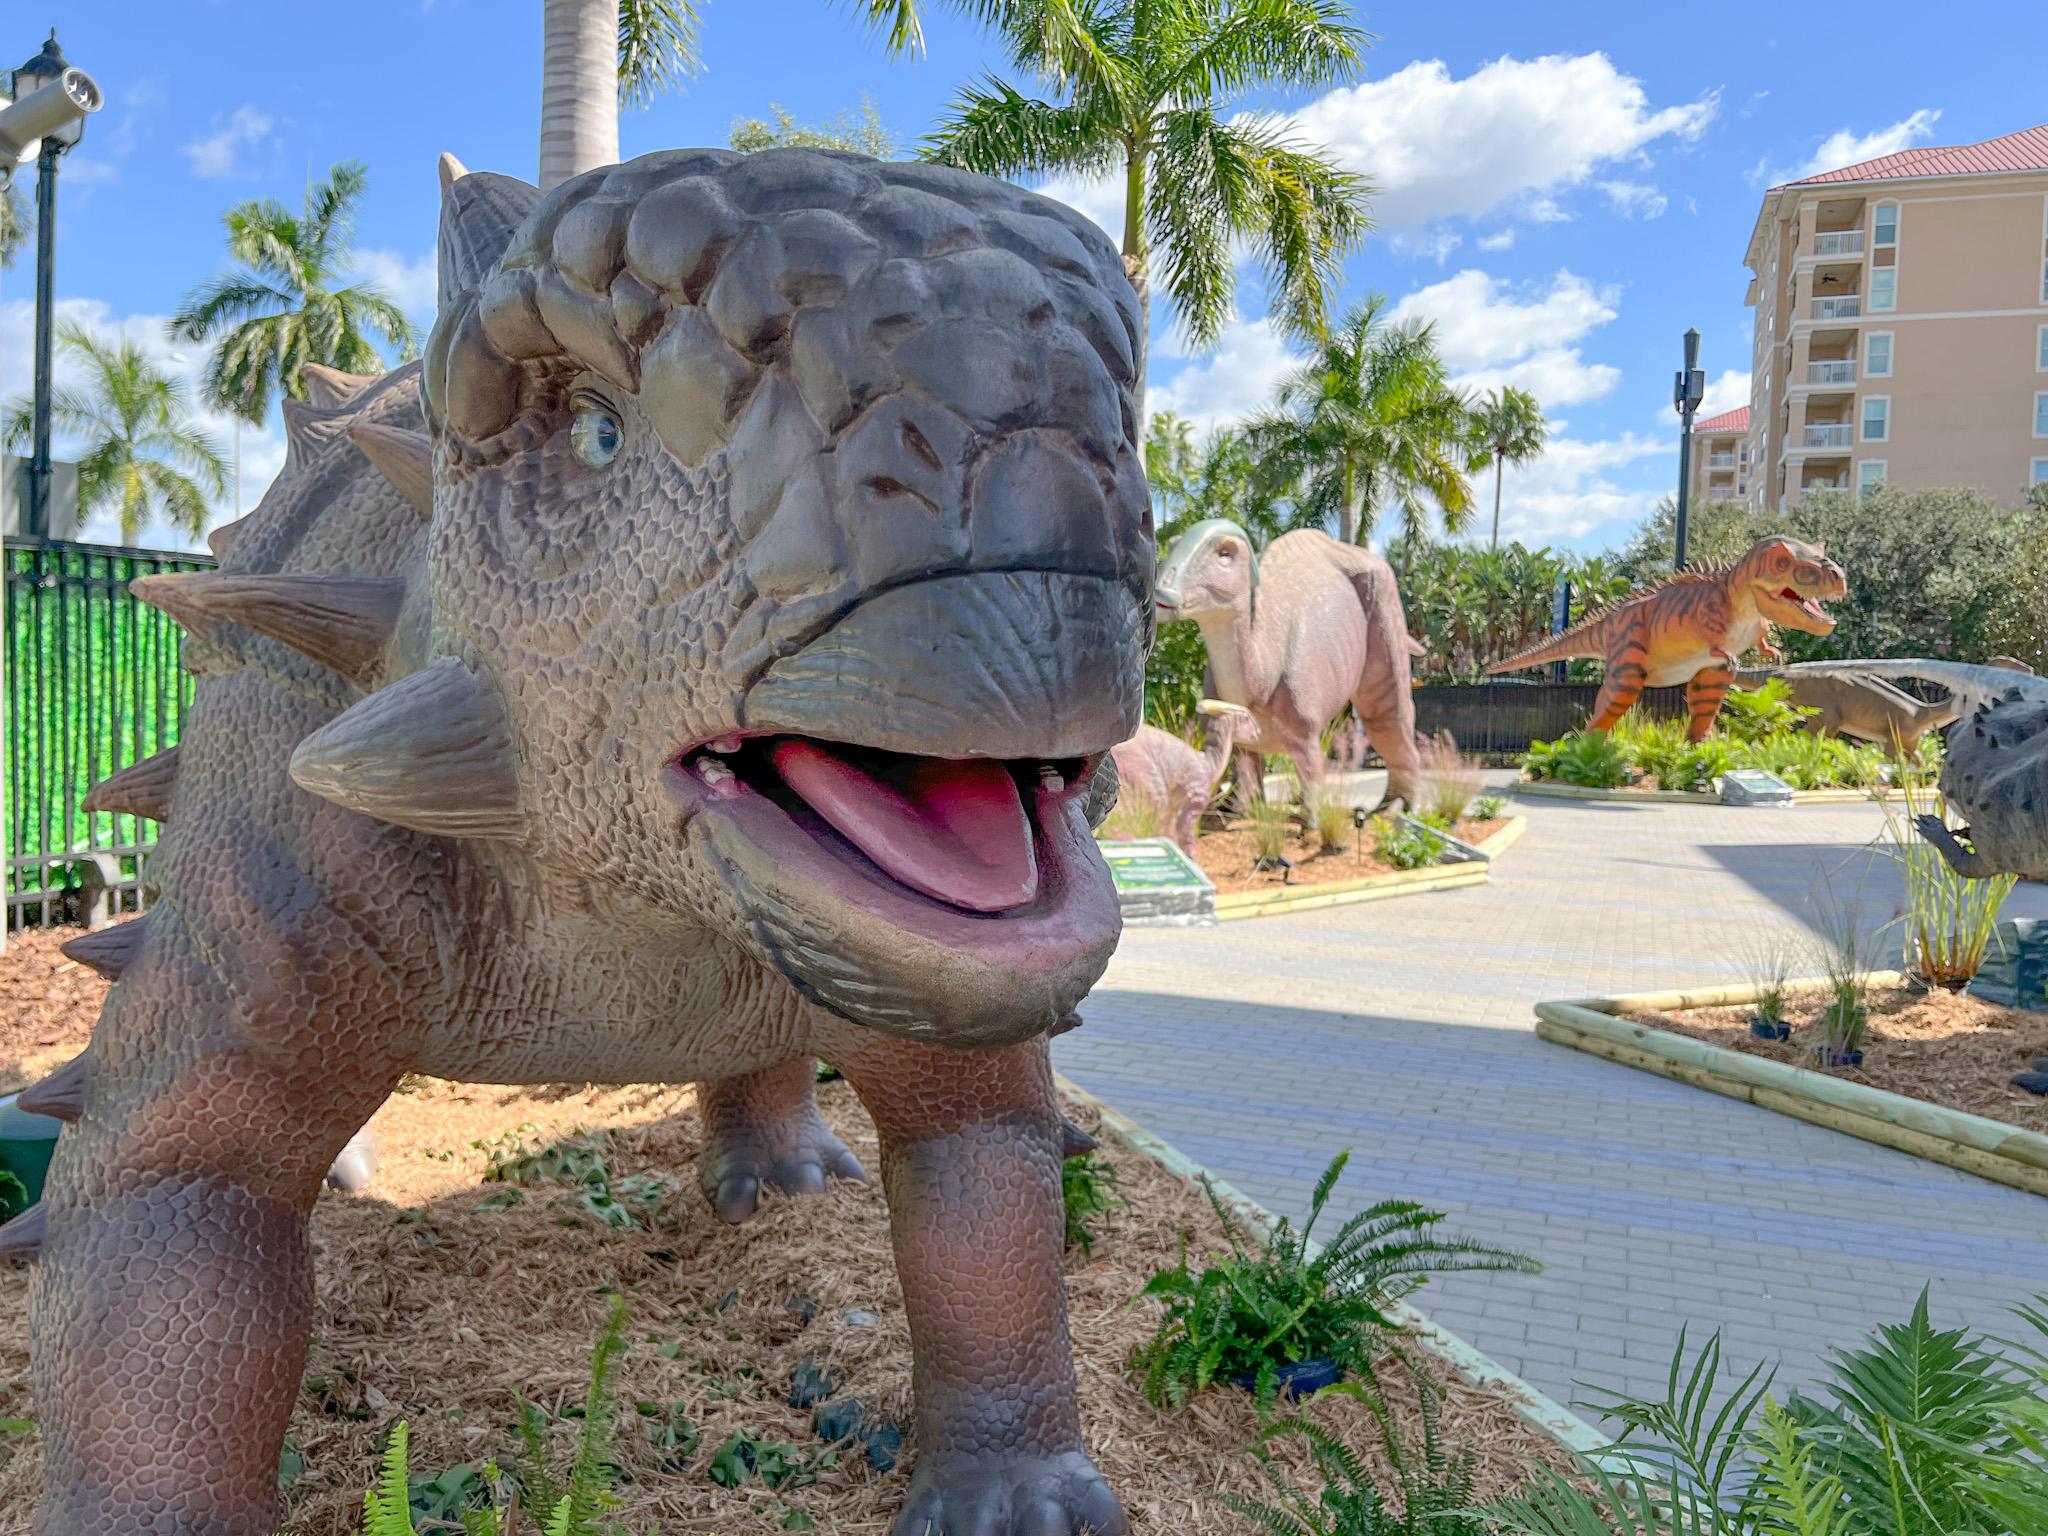 Dino Don's DinoVenture Invades The Bishop Museum in Bradenton